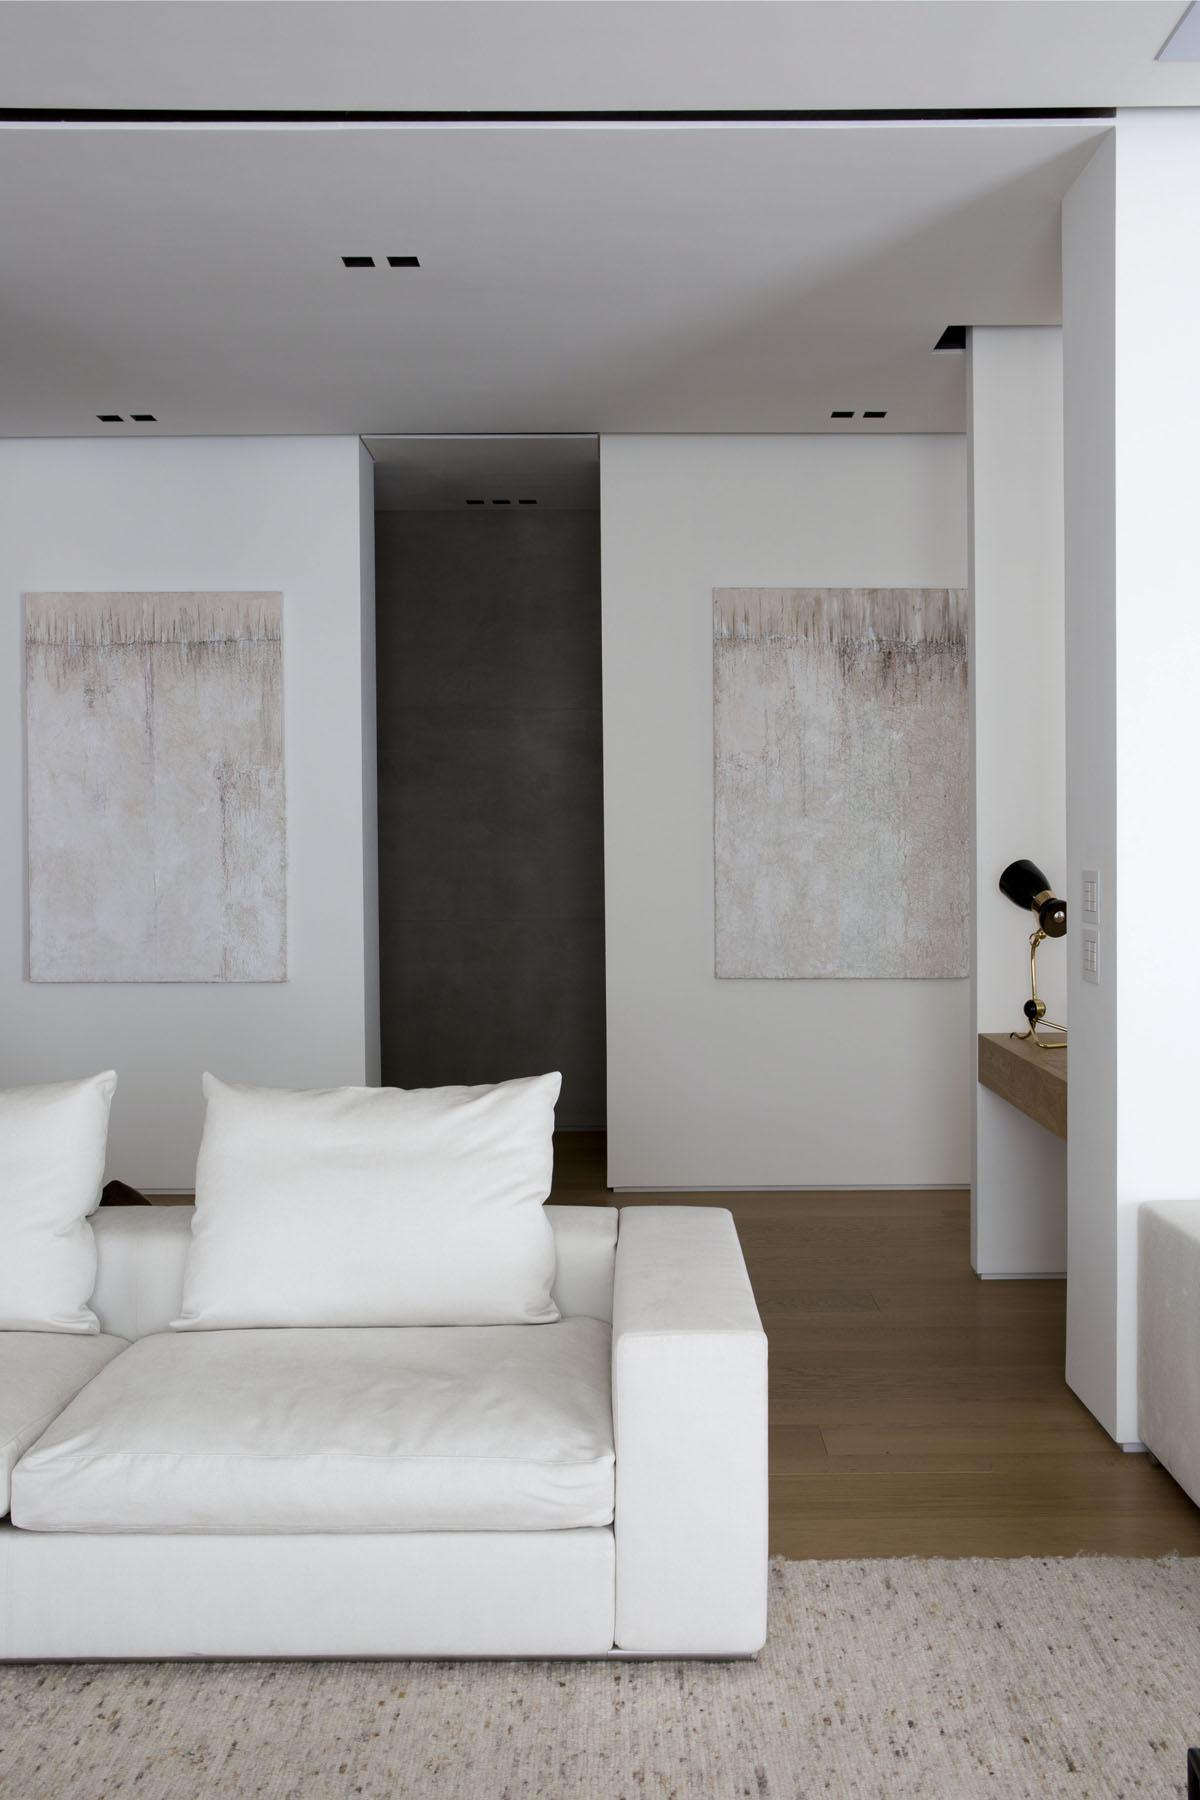 08 bonucci Sleek Modern by Fabio Fantolino